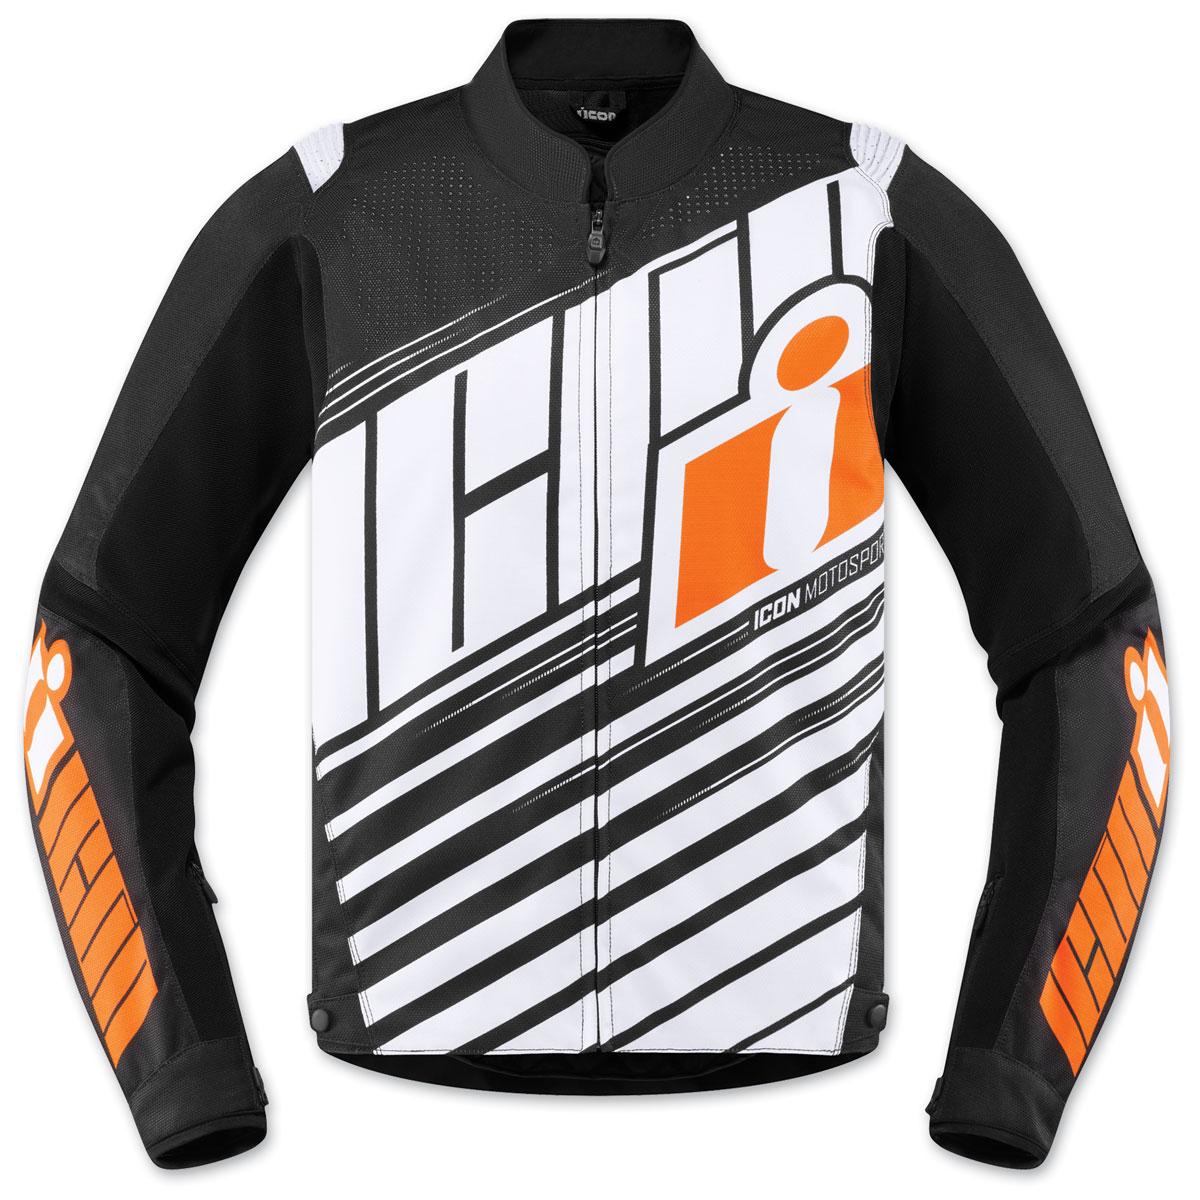 ICON Men's Overlord SB2 Orange Jacket